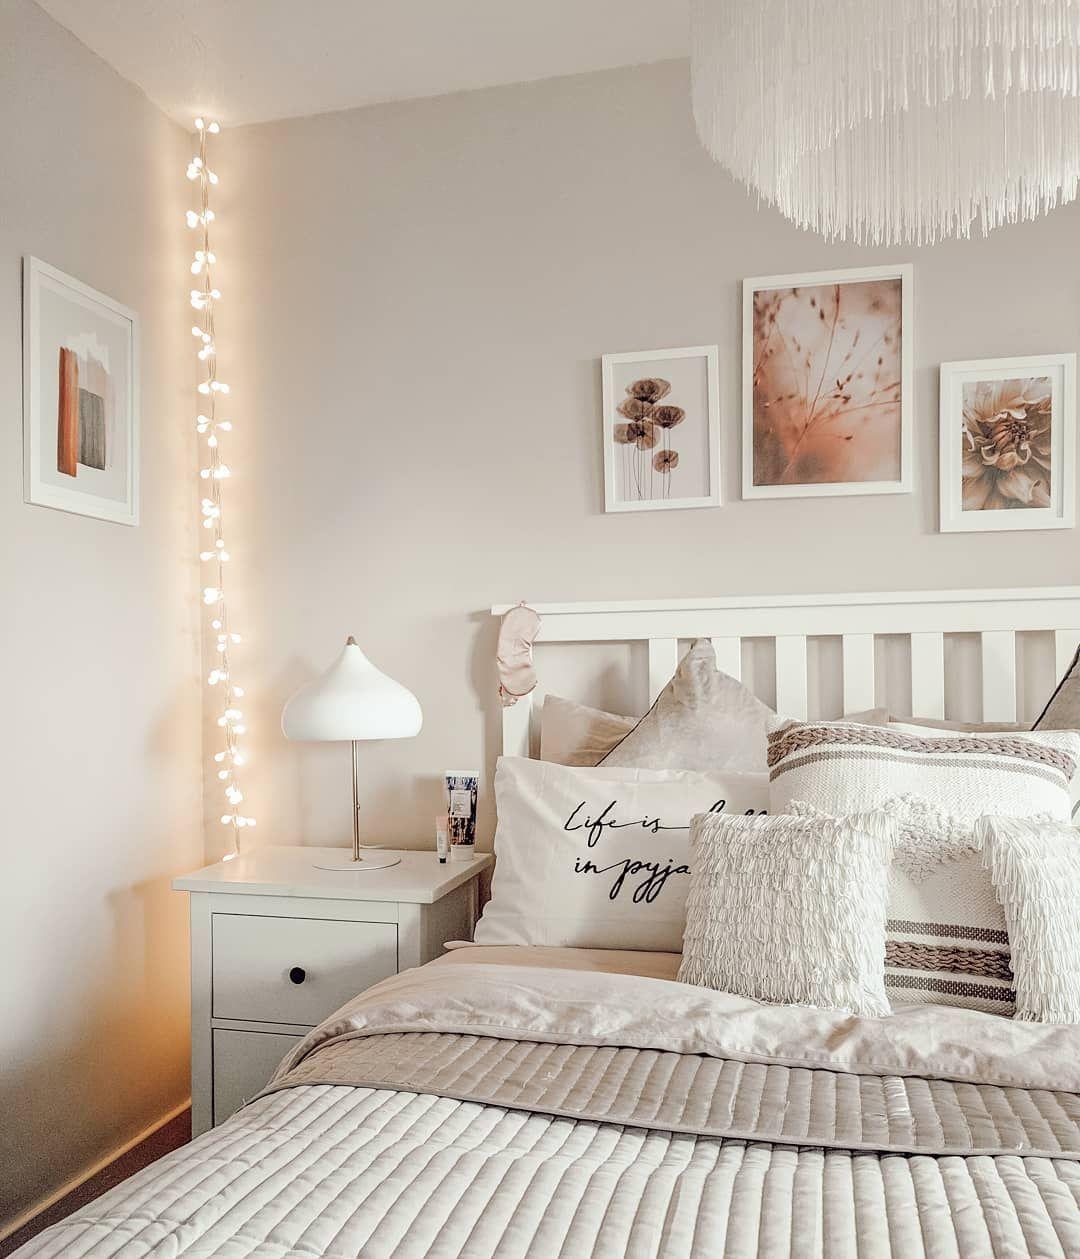 Ikea Malm In The Bedroom Inneneinrichtung Schlafzimmer Weiss Zimmer